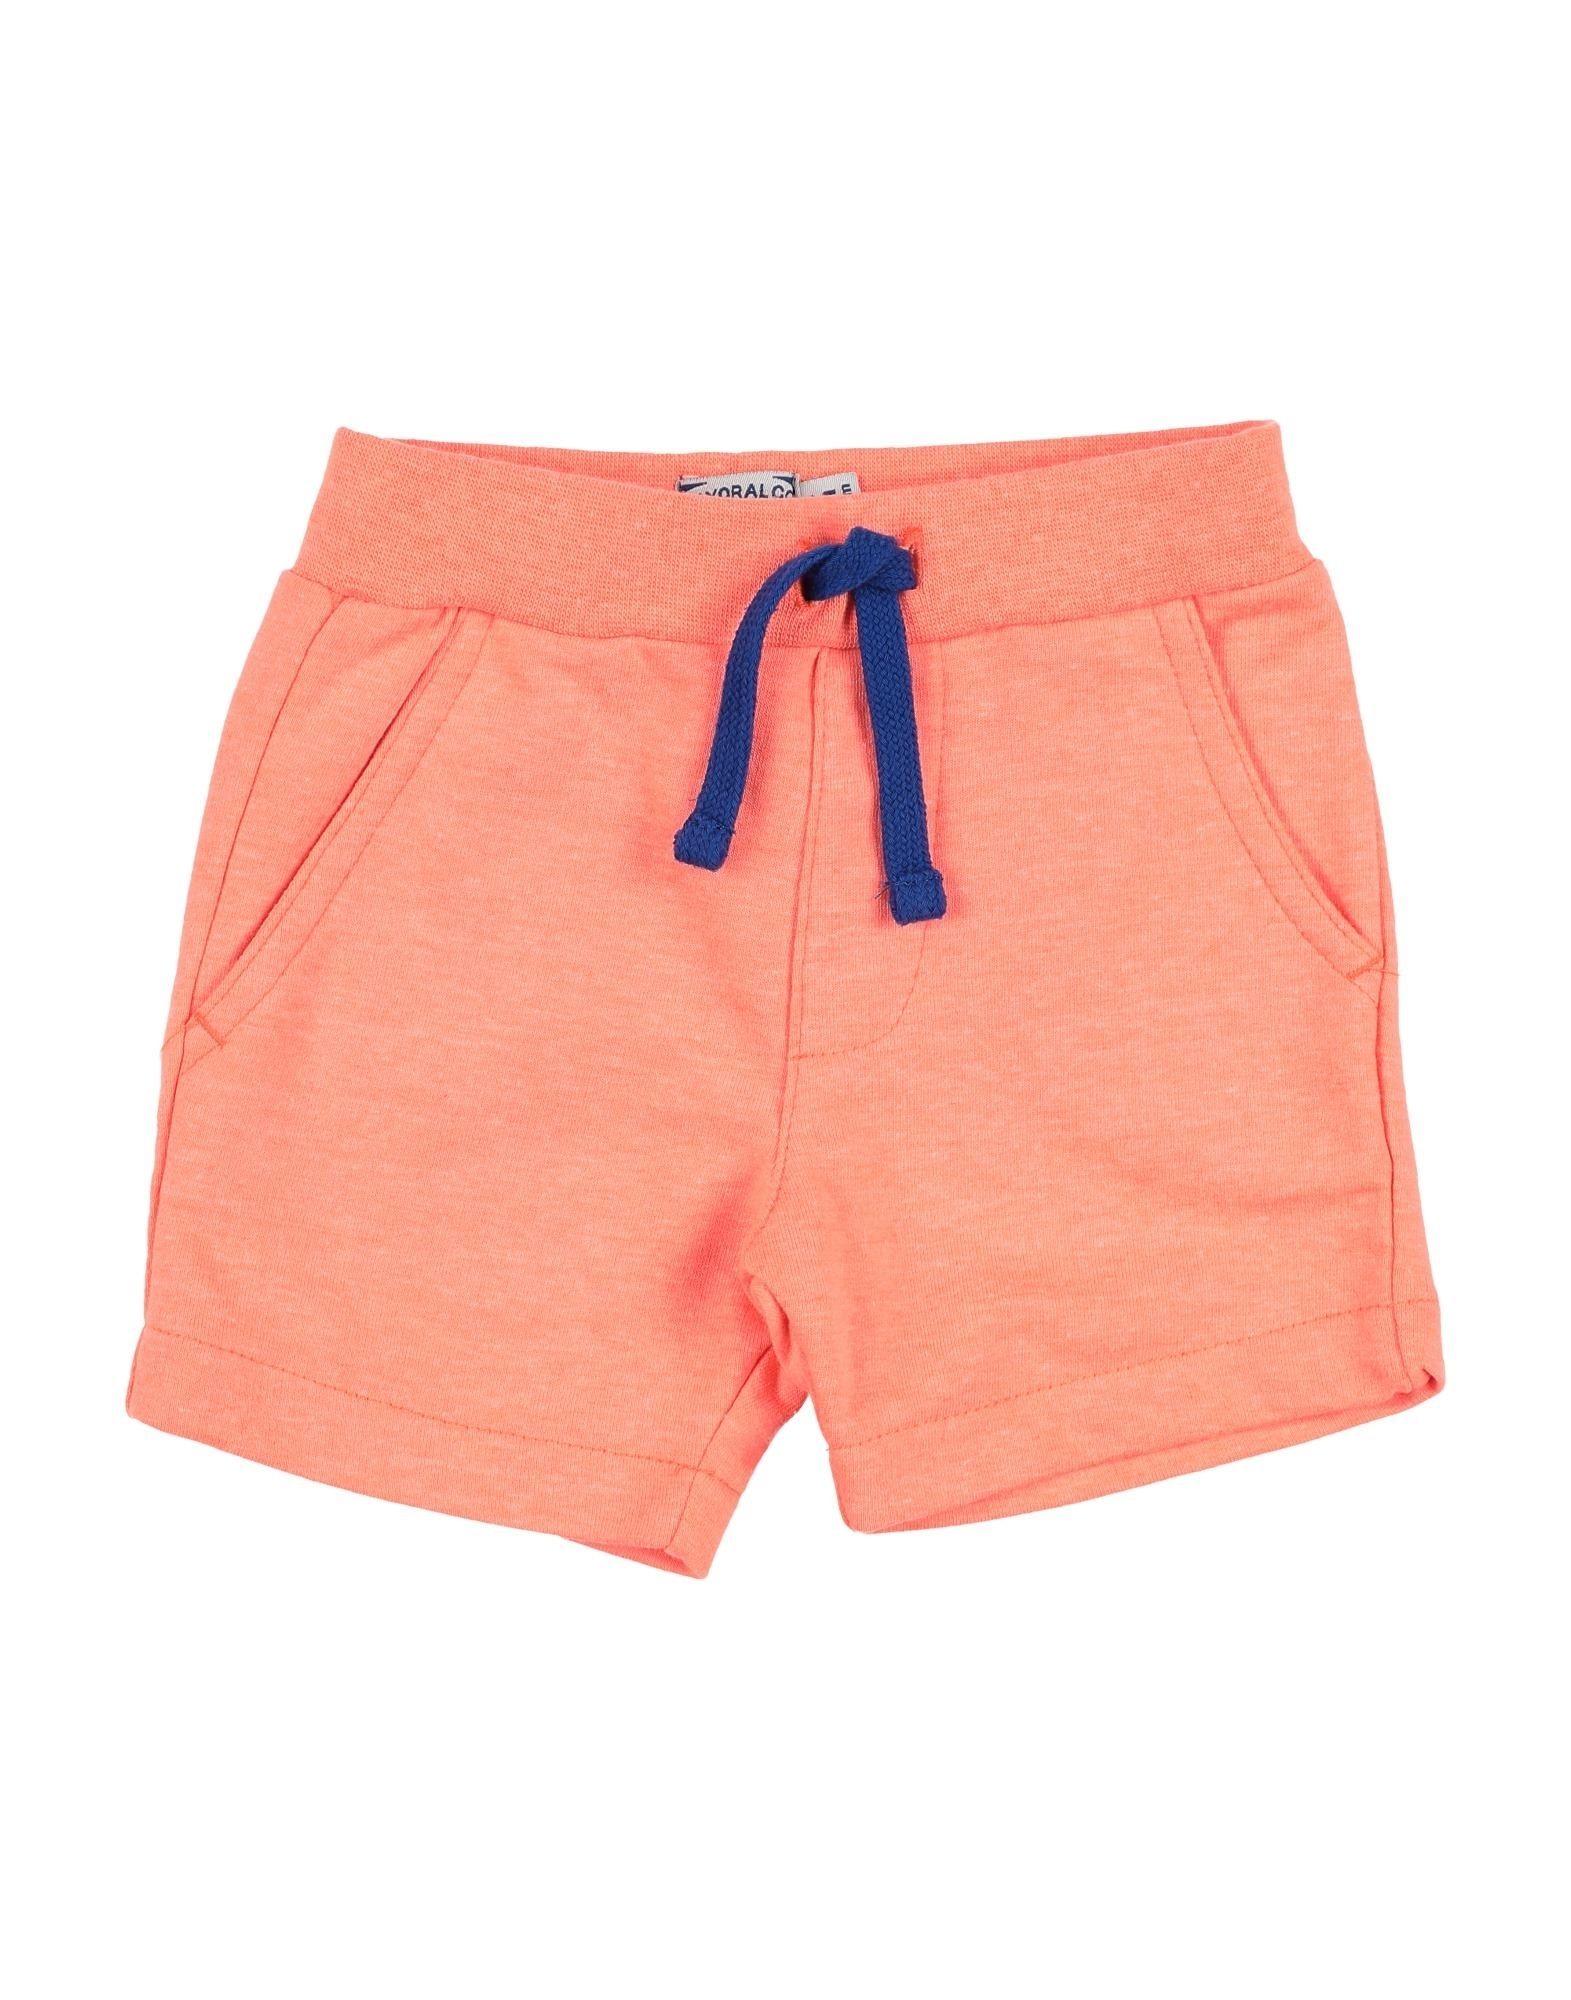 Mayoral Kids' Shorts In Orange